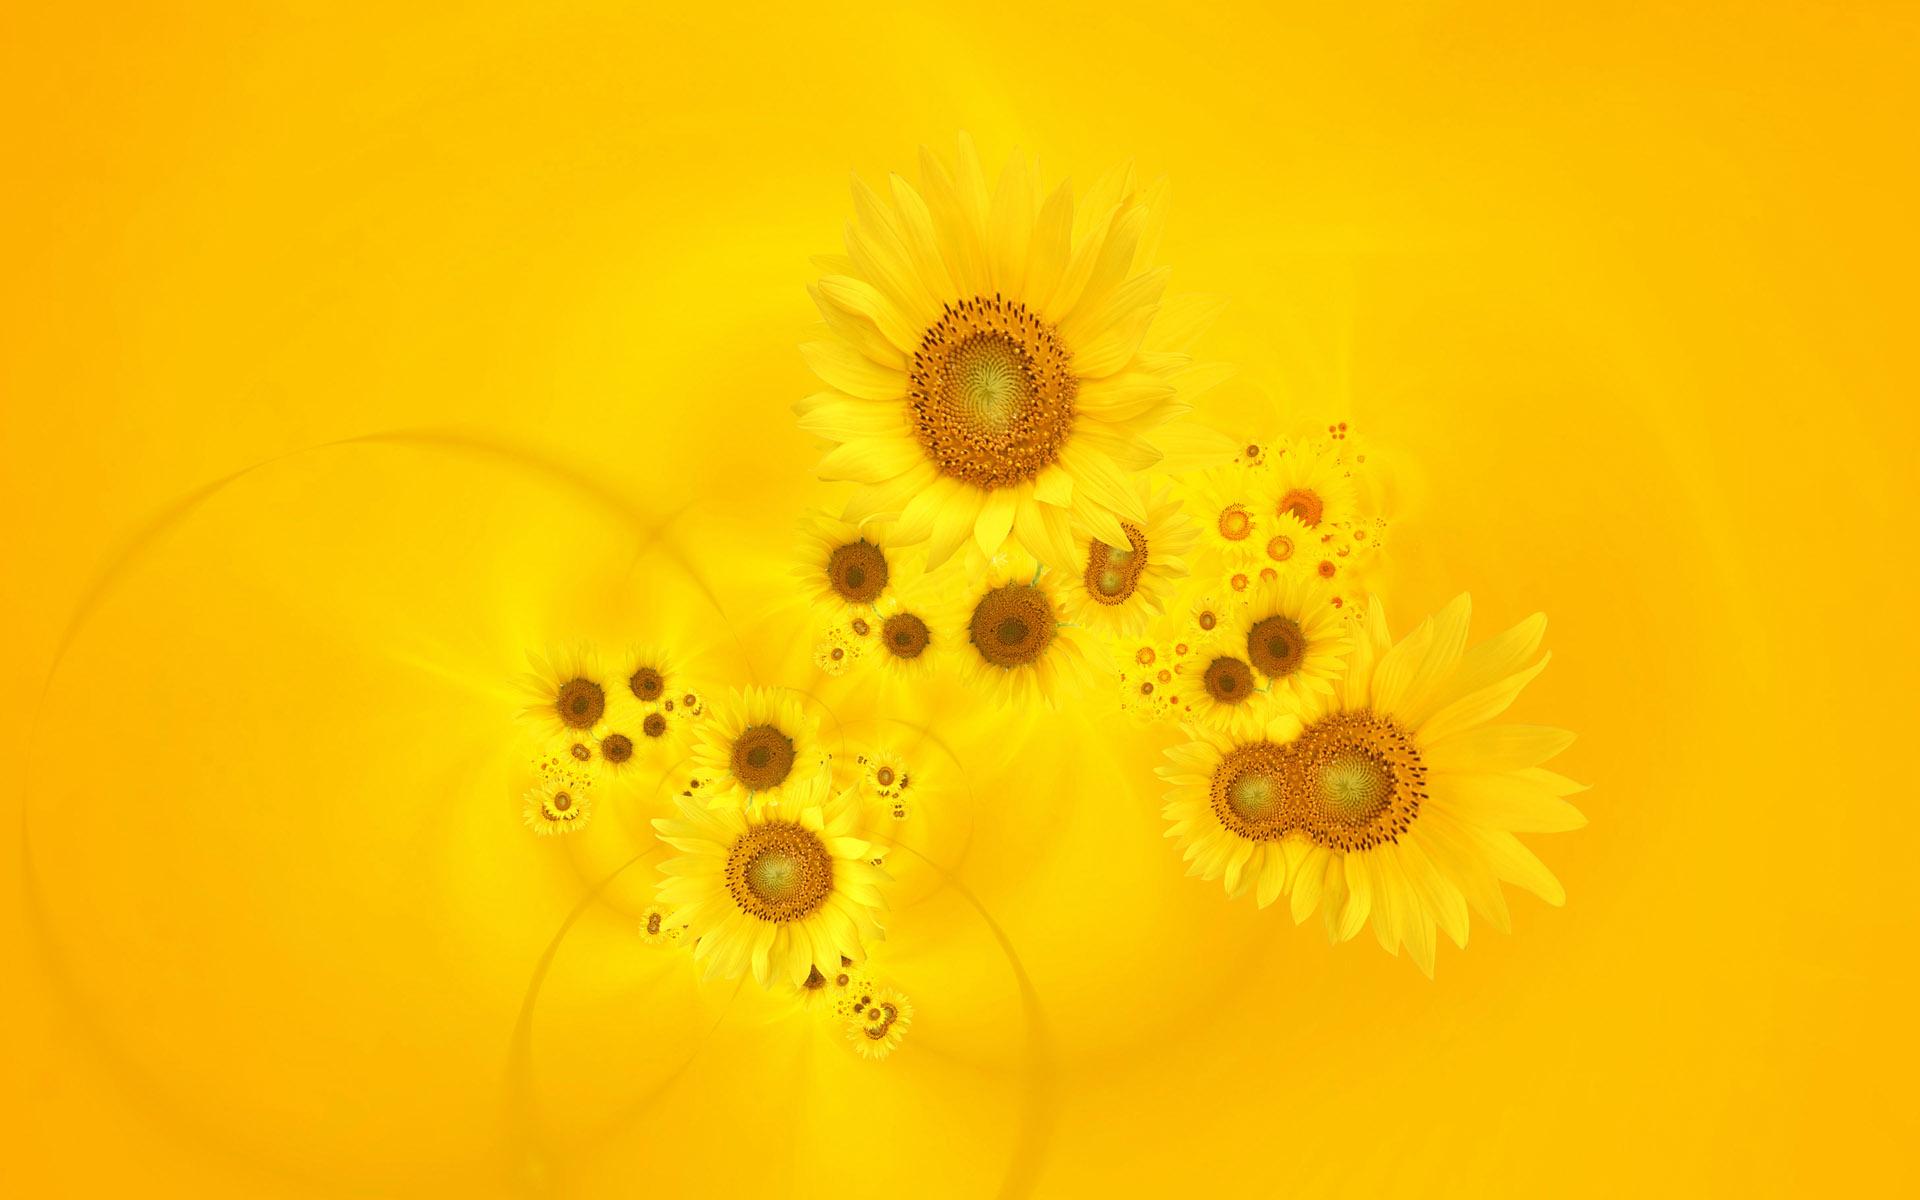 Bright Yellow Wallpaper yellow wallpaper hd - wallpapersafari